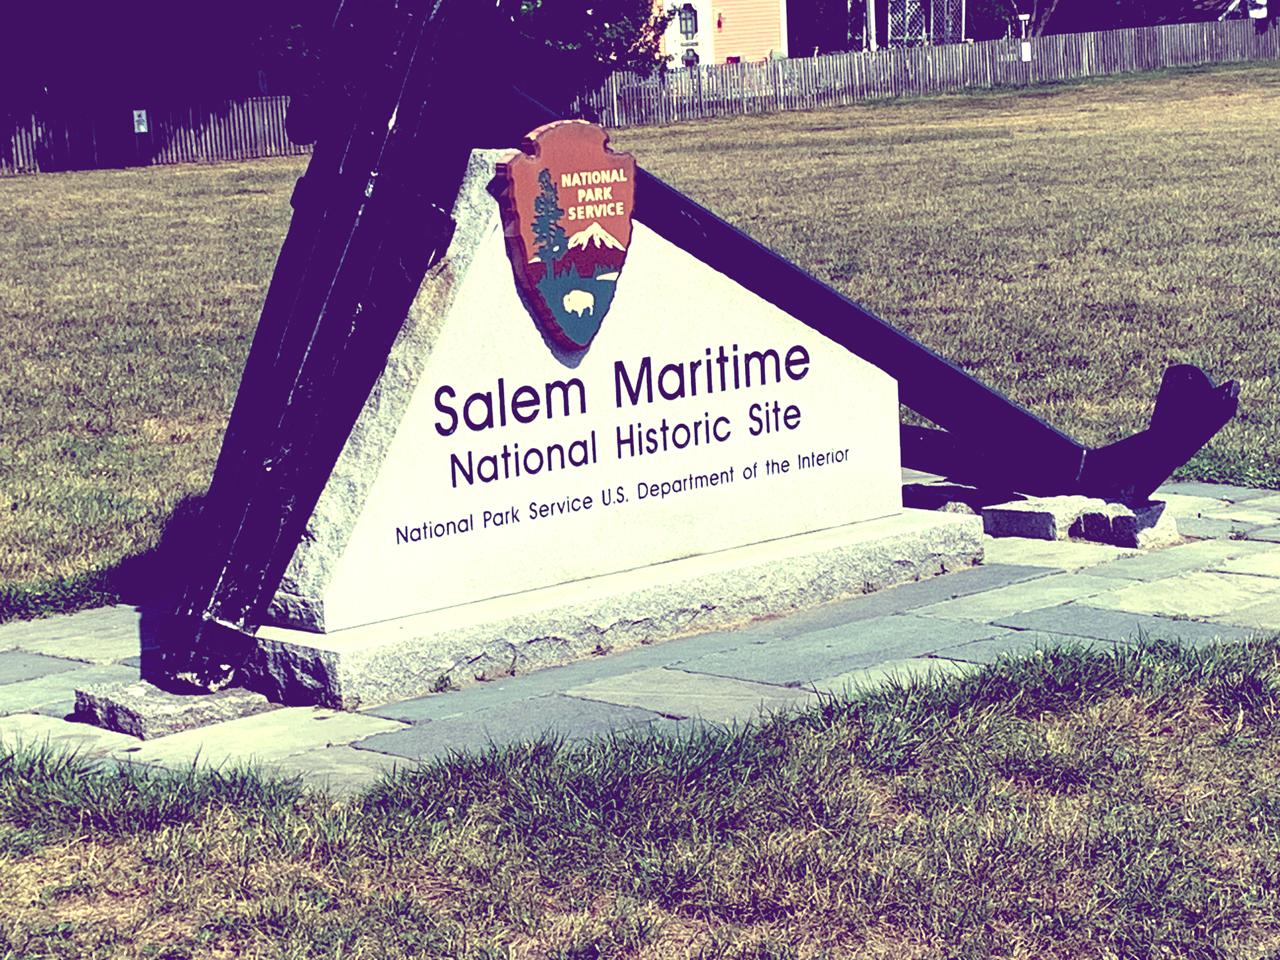 salem-maritime-national-historic-site-massachusetts-1280x960-01